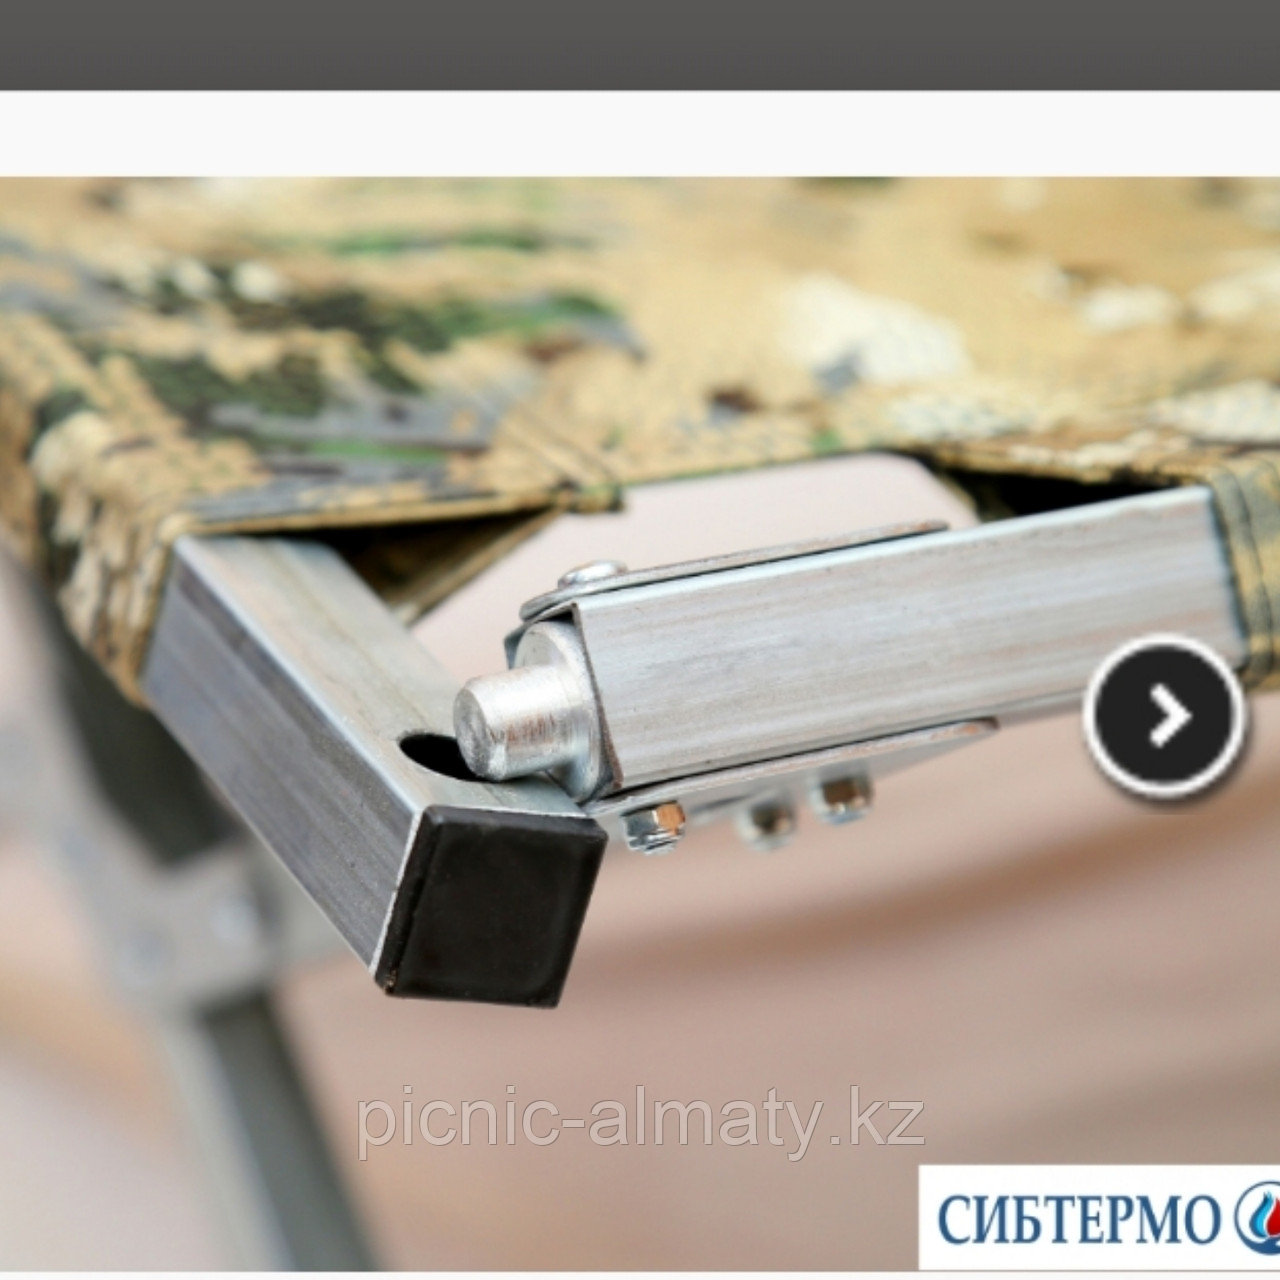 Раскладушка сибтермо - фото 2